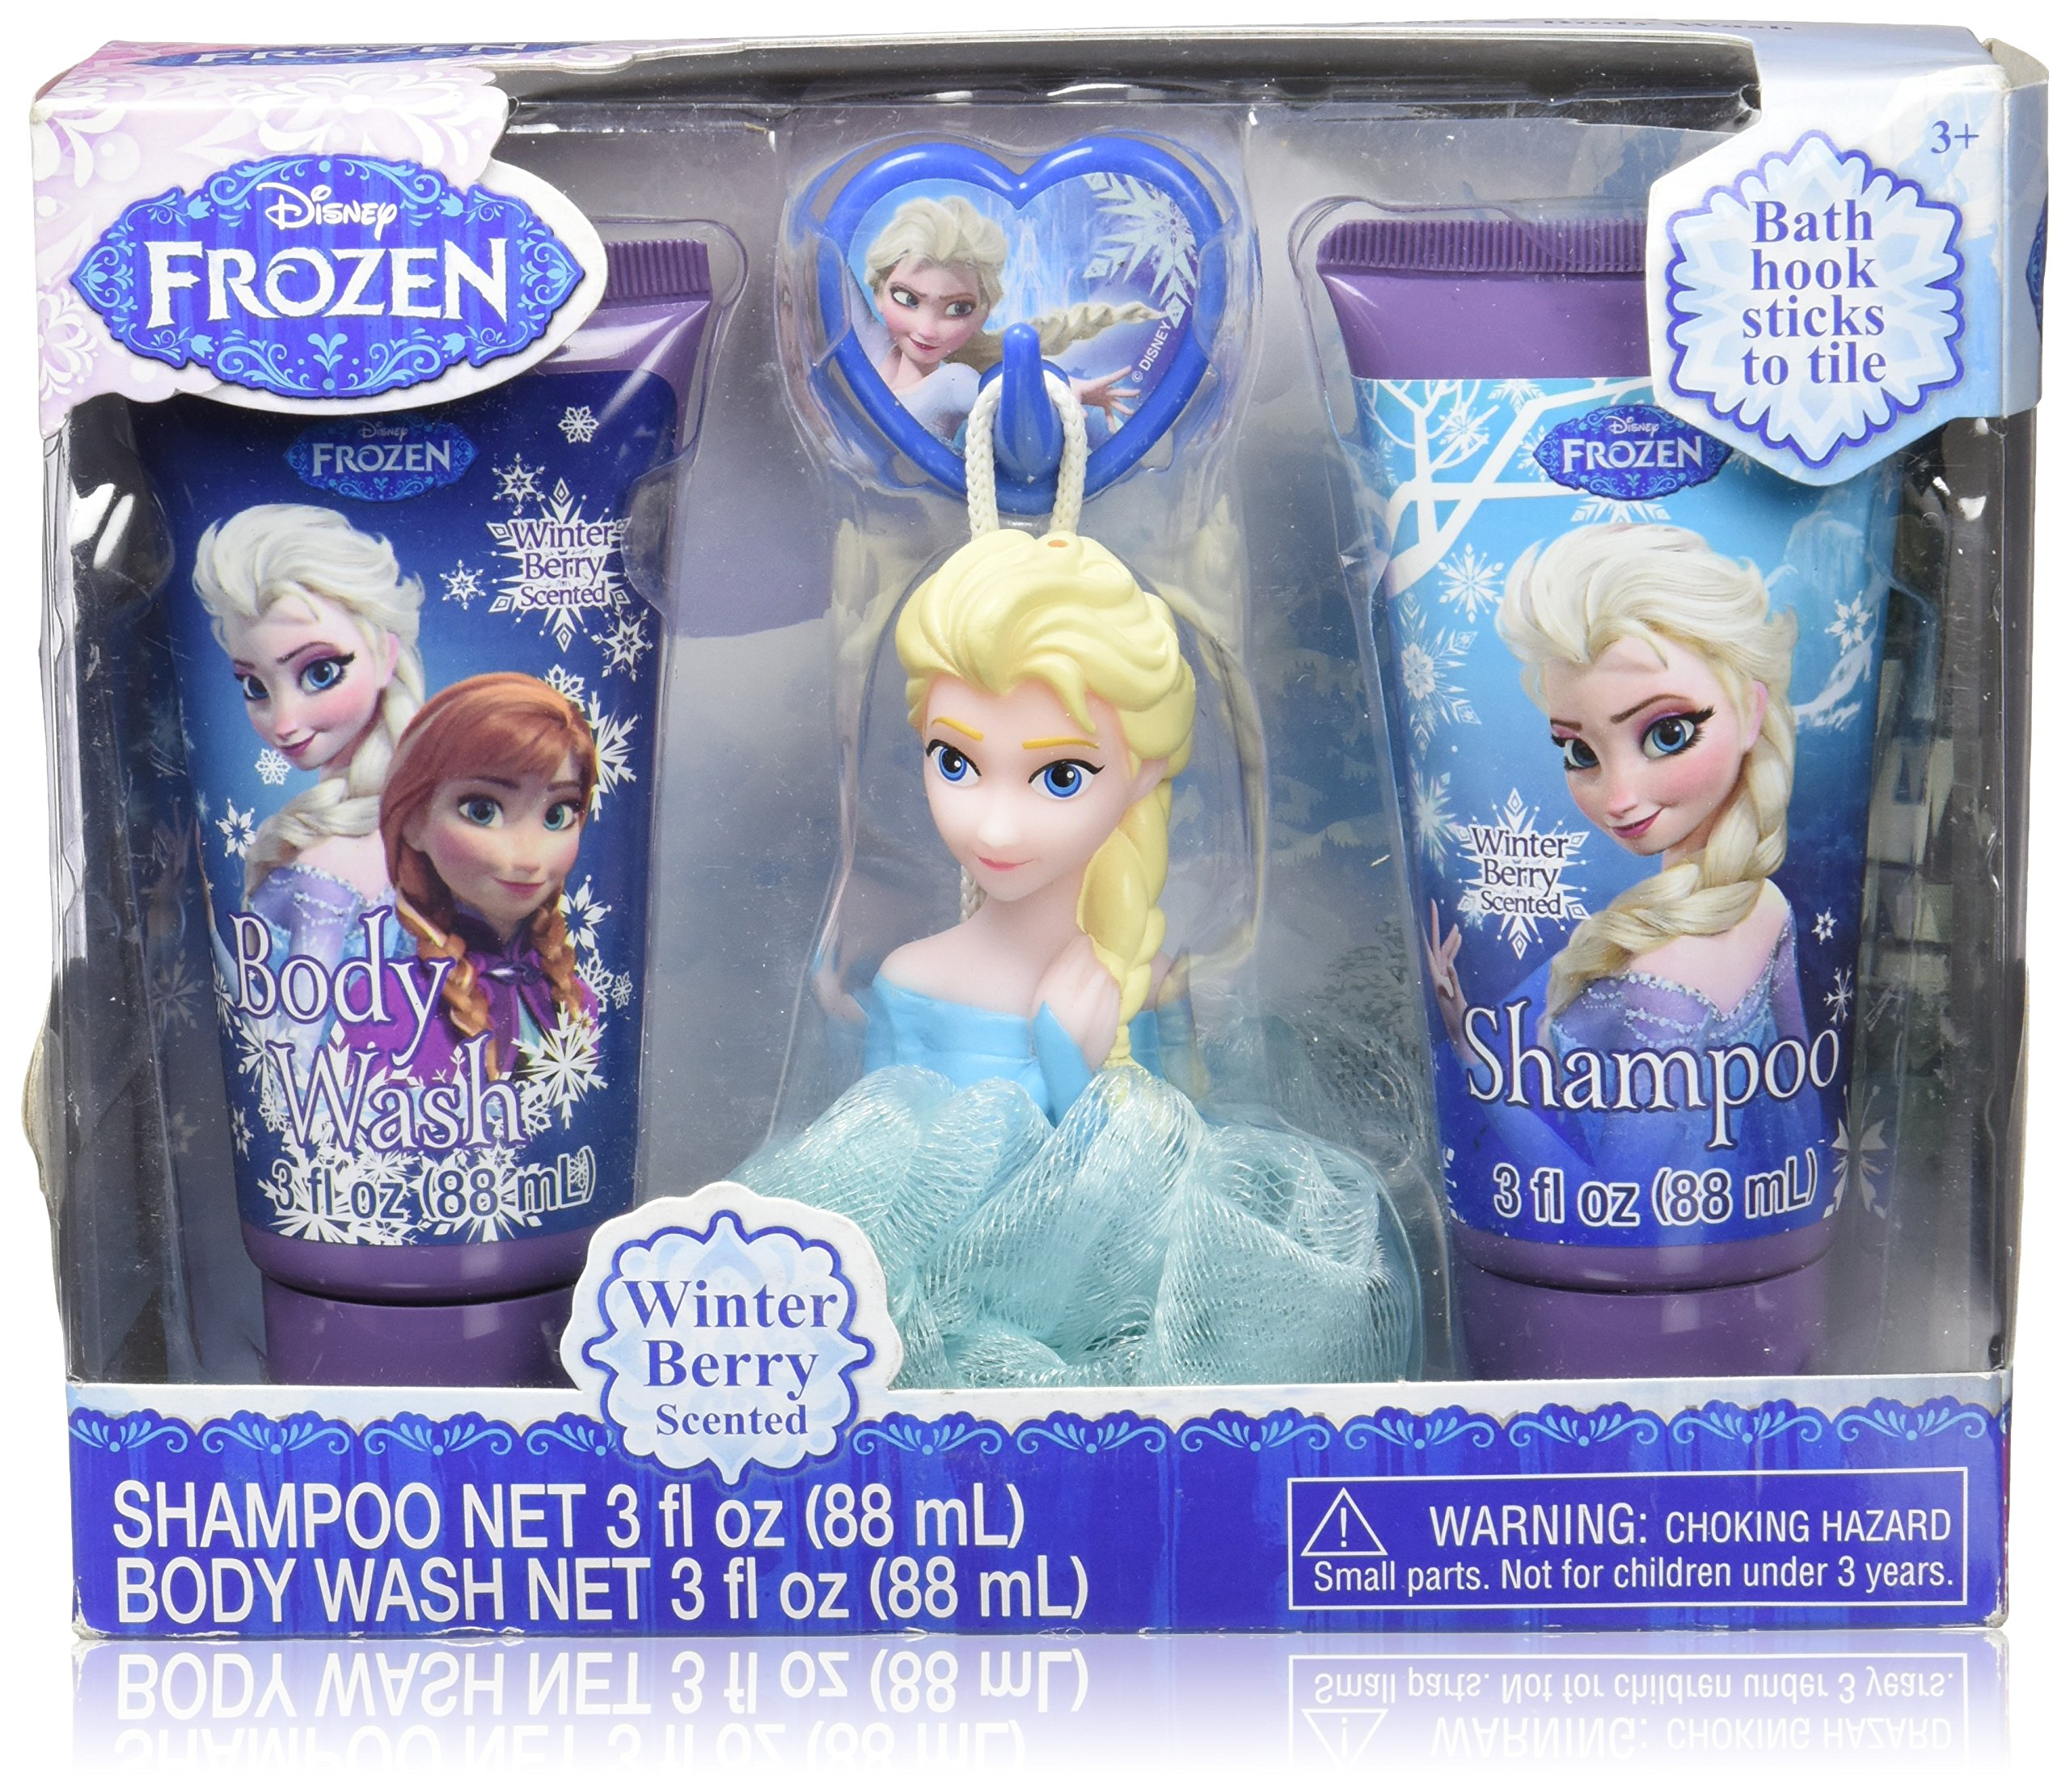 Disney's Frozen Elsa Shampoo & Body Wash Set